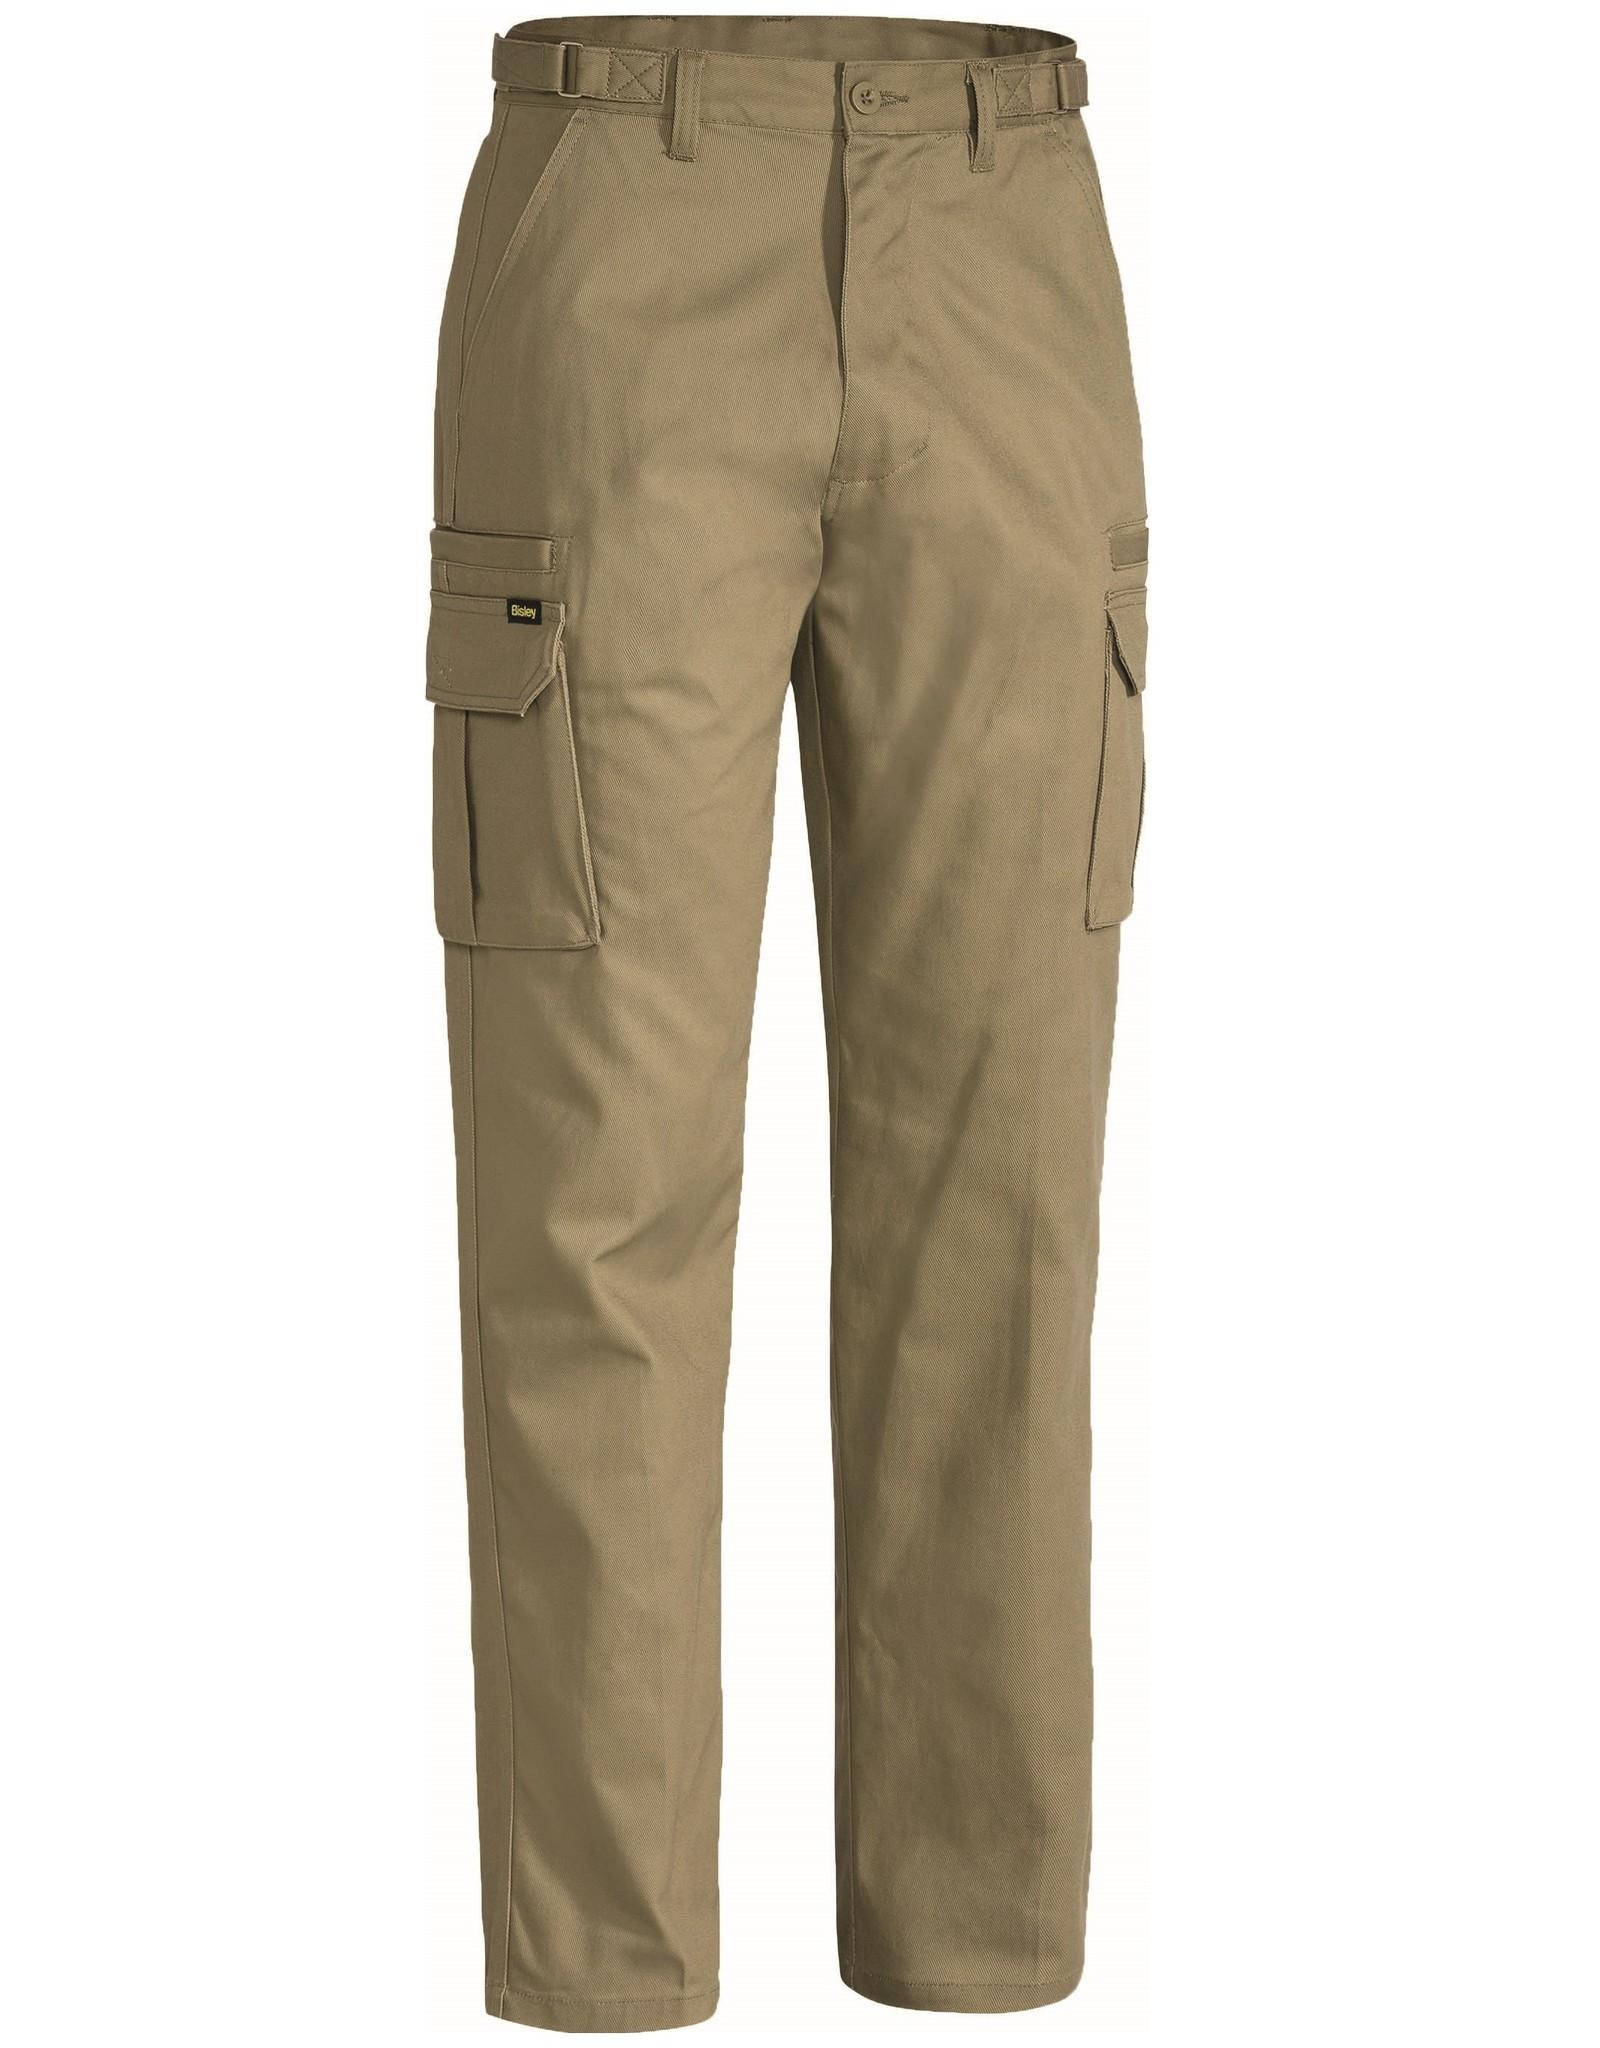 Bisley Bisley Original 8 Pocket Cargo Work Pant